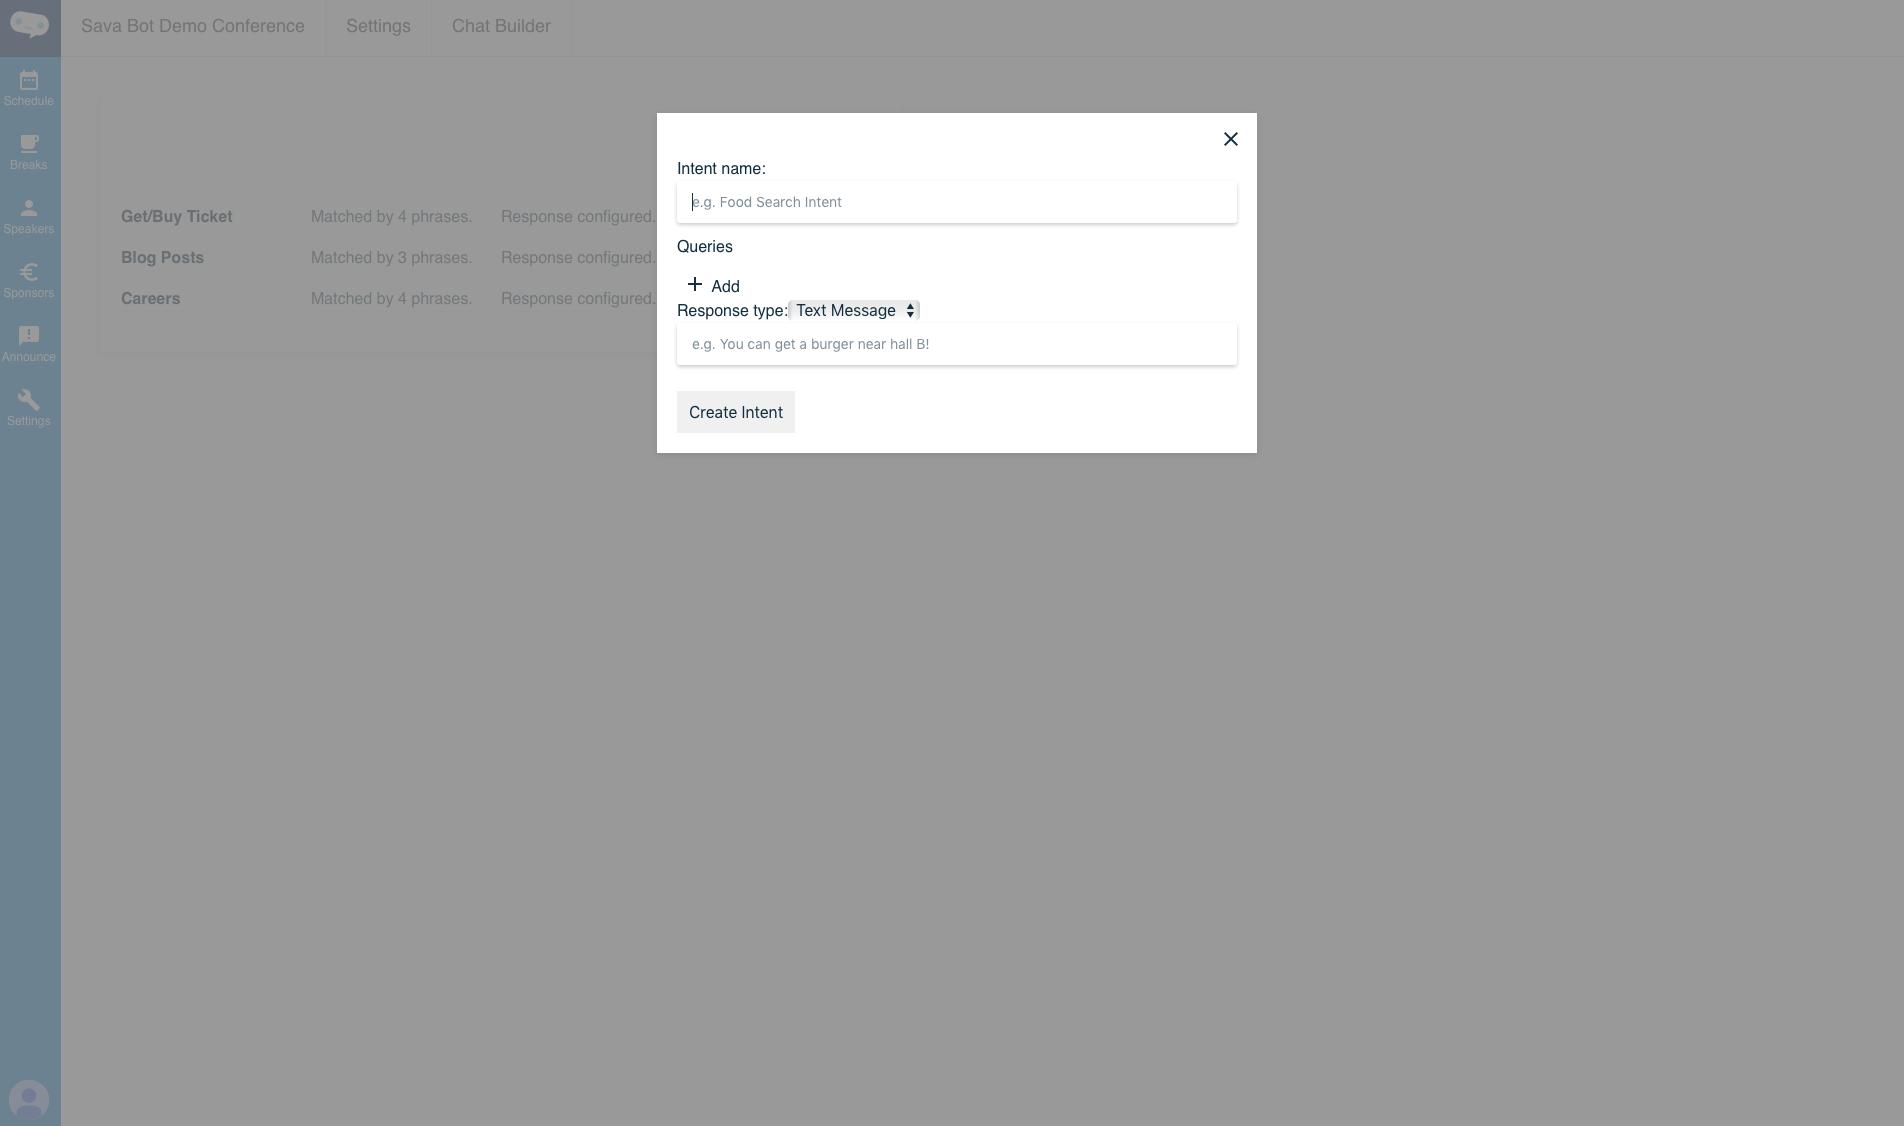 Chatbot settings